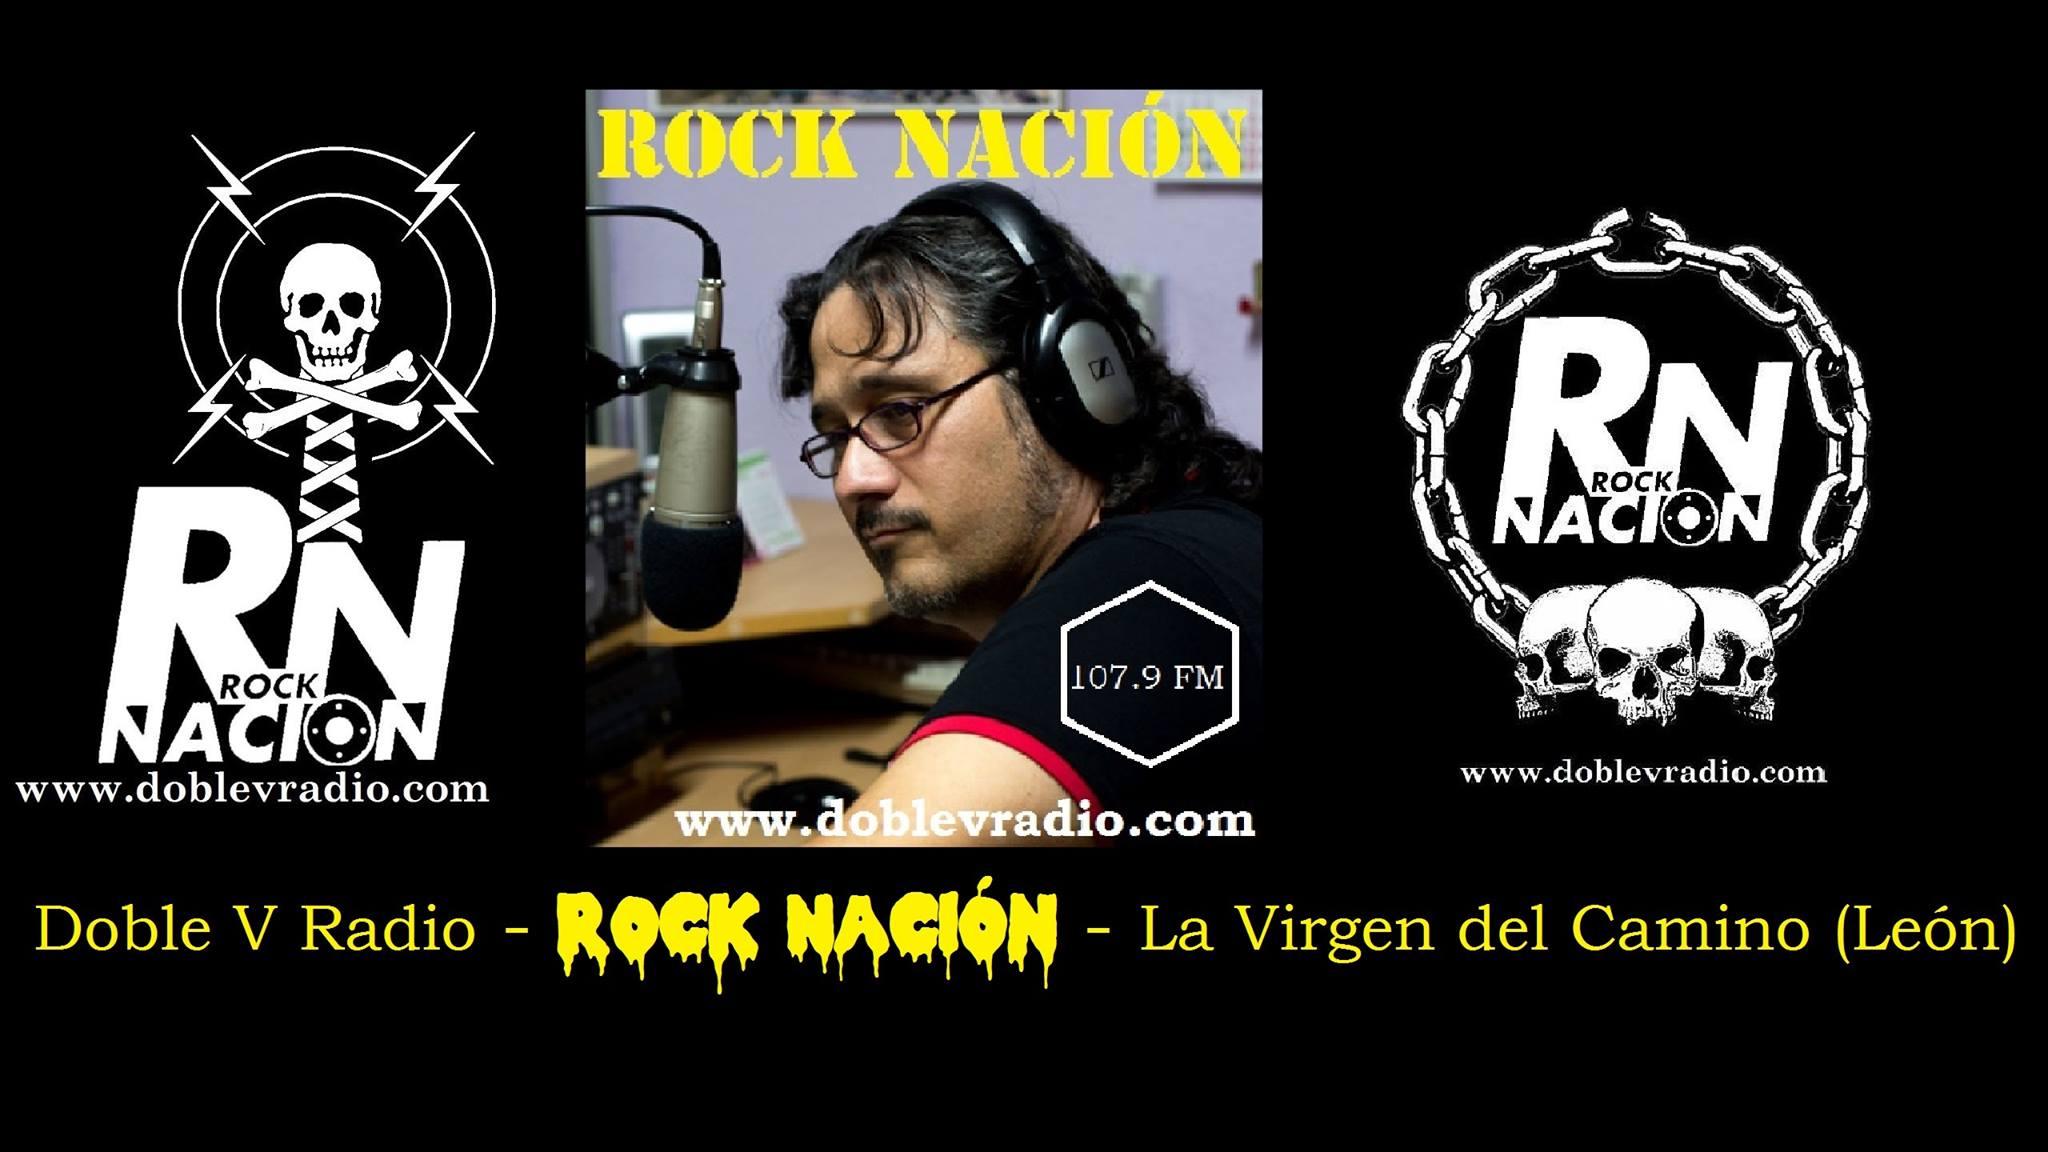 Rock Nación - Programa Doble V Radio